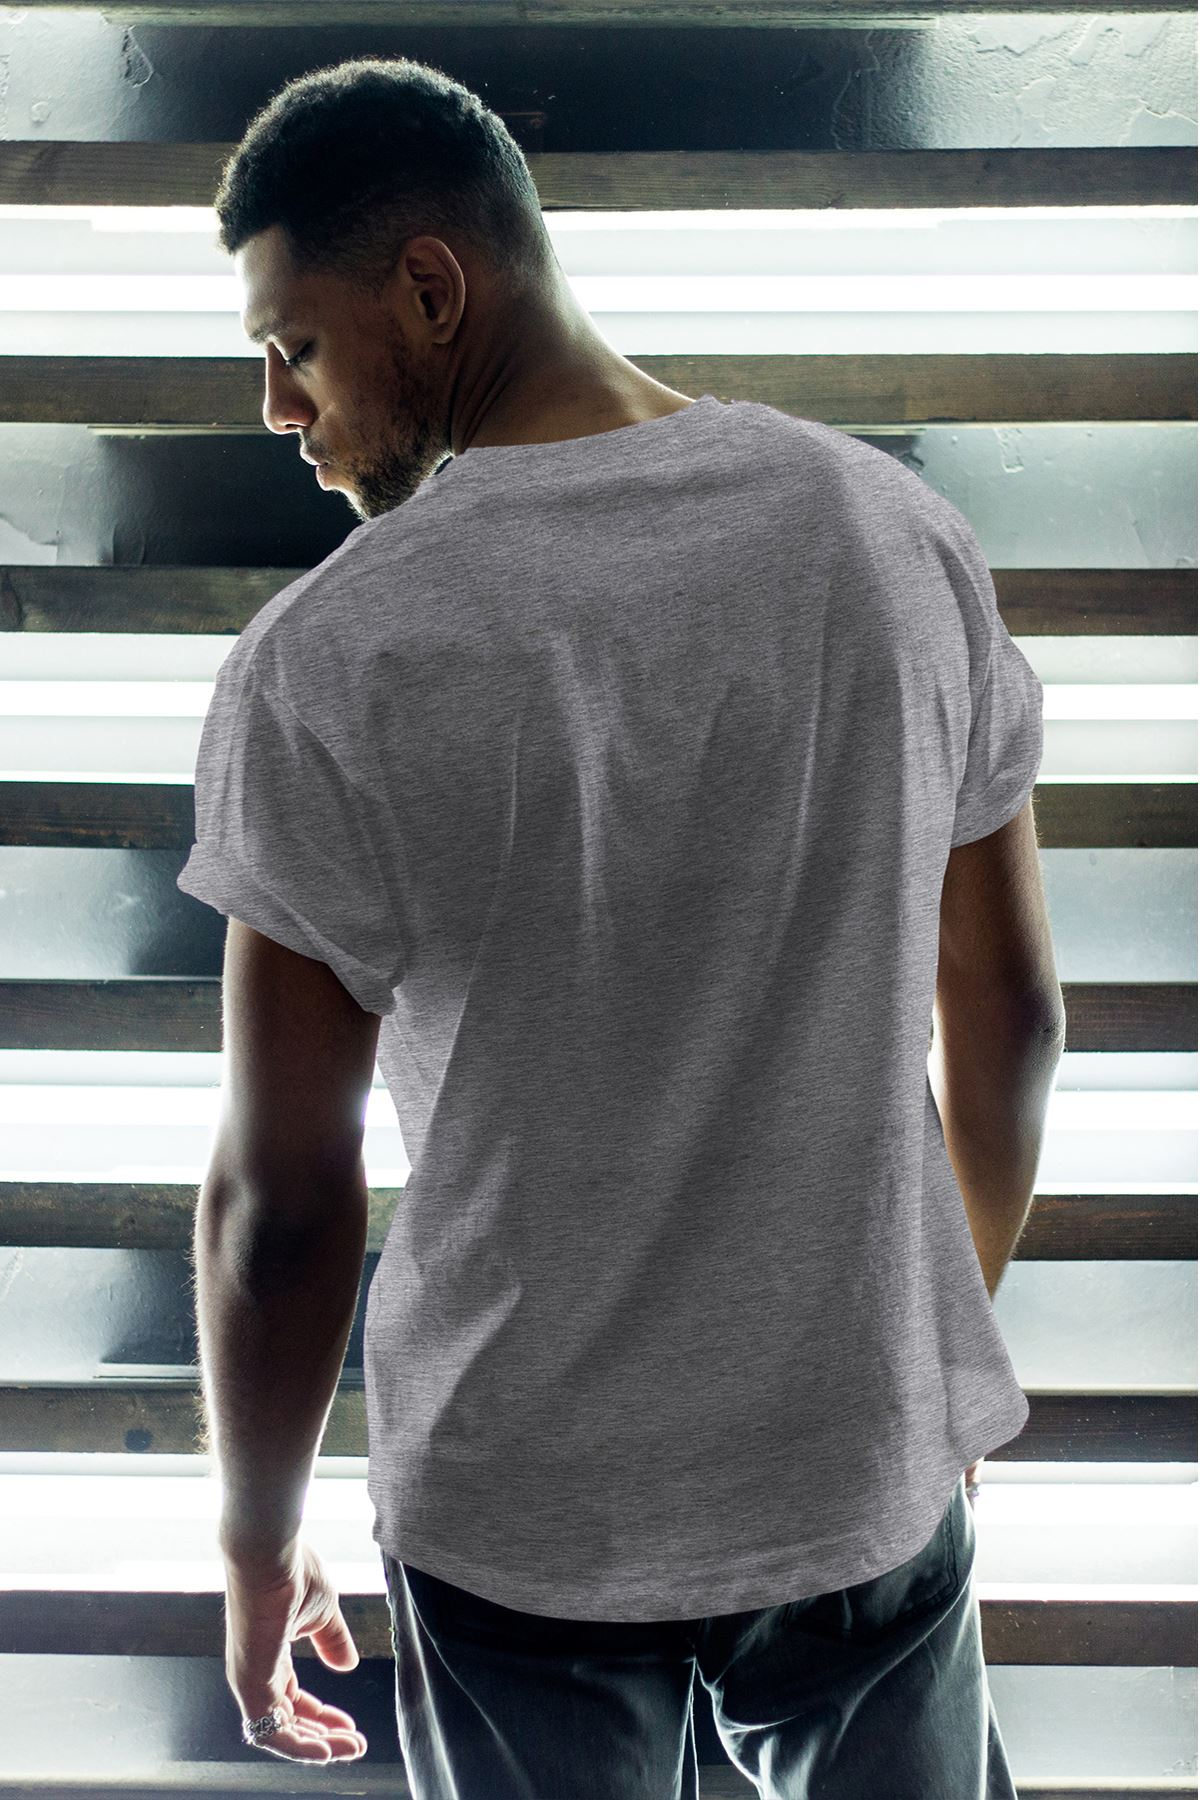 Boston Celtics 26 Gri Erkek Oversize Tshirt - Tişört